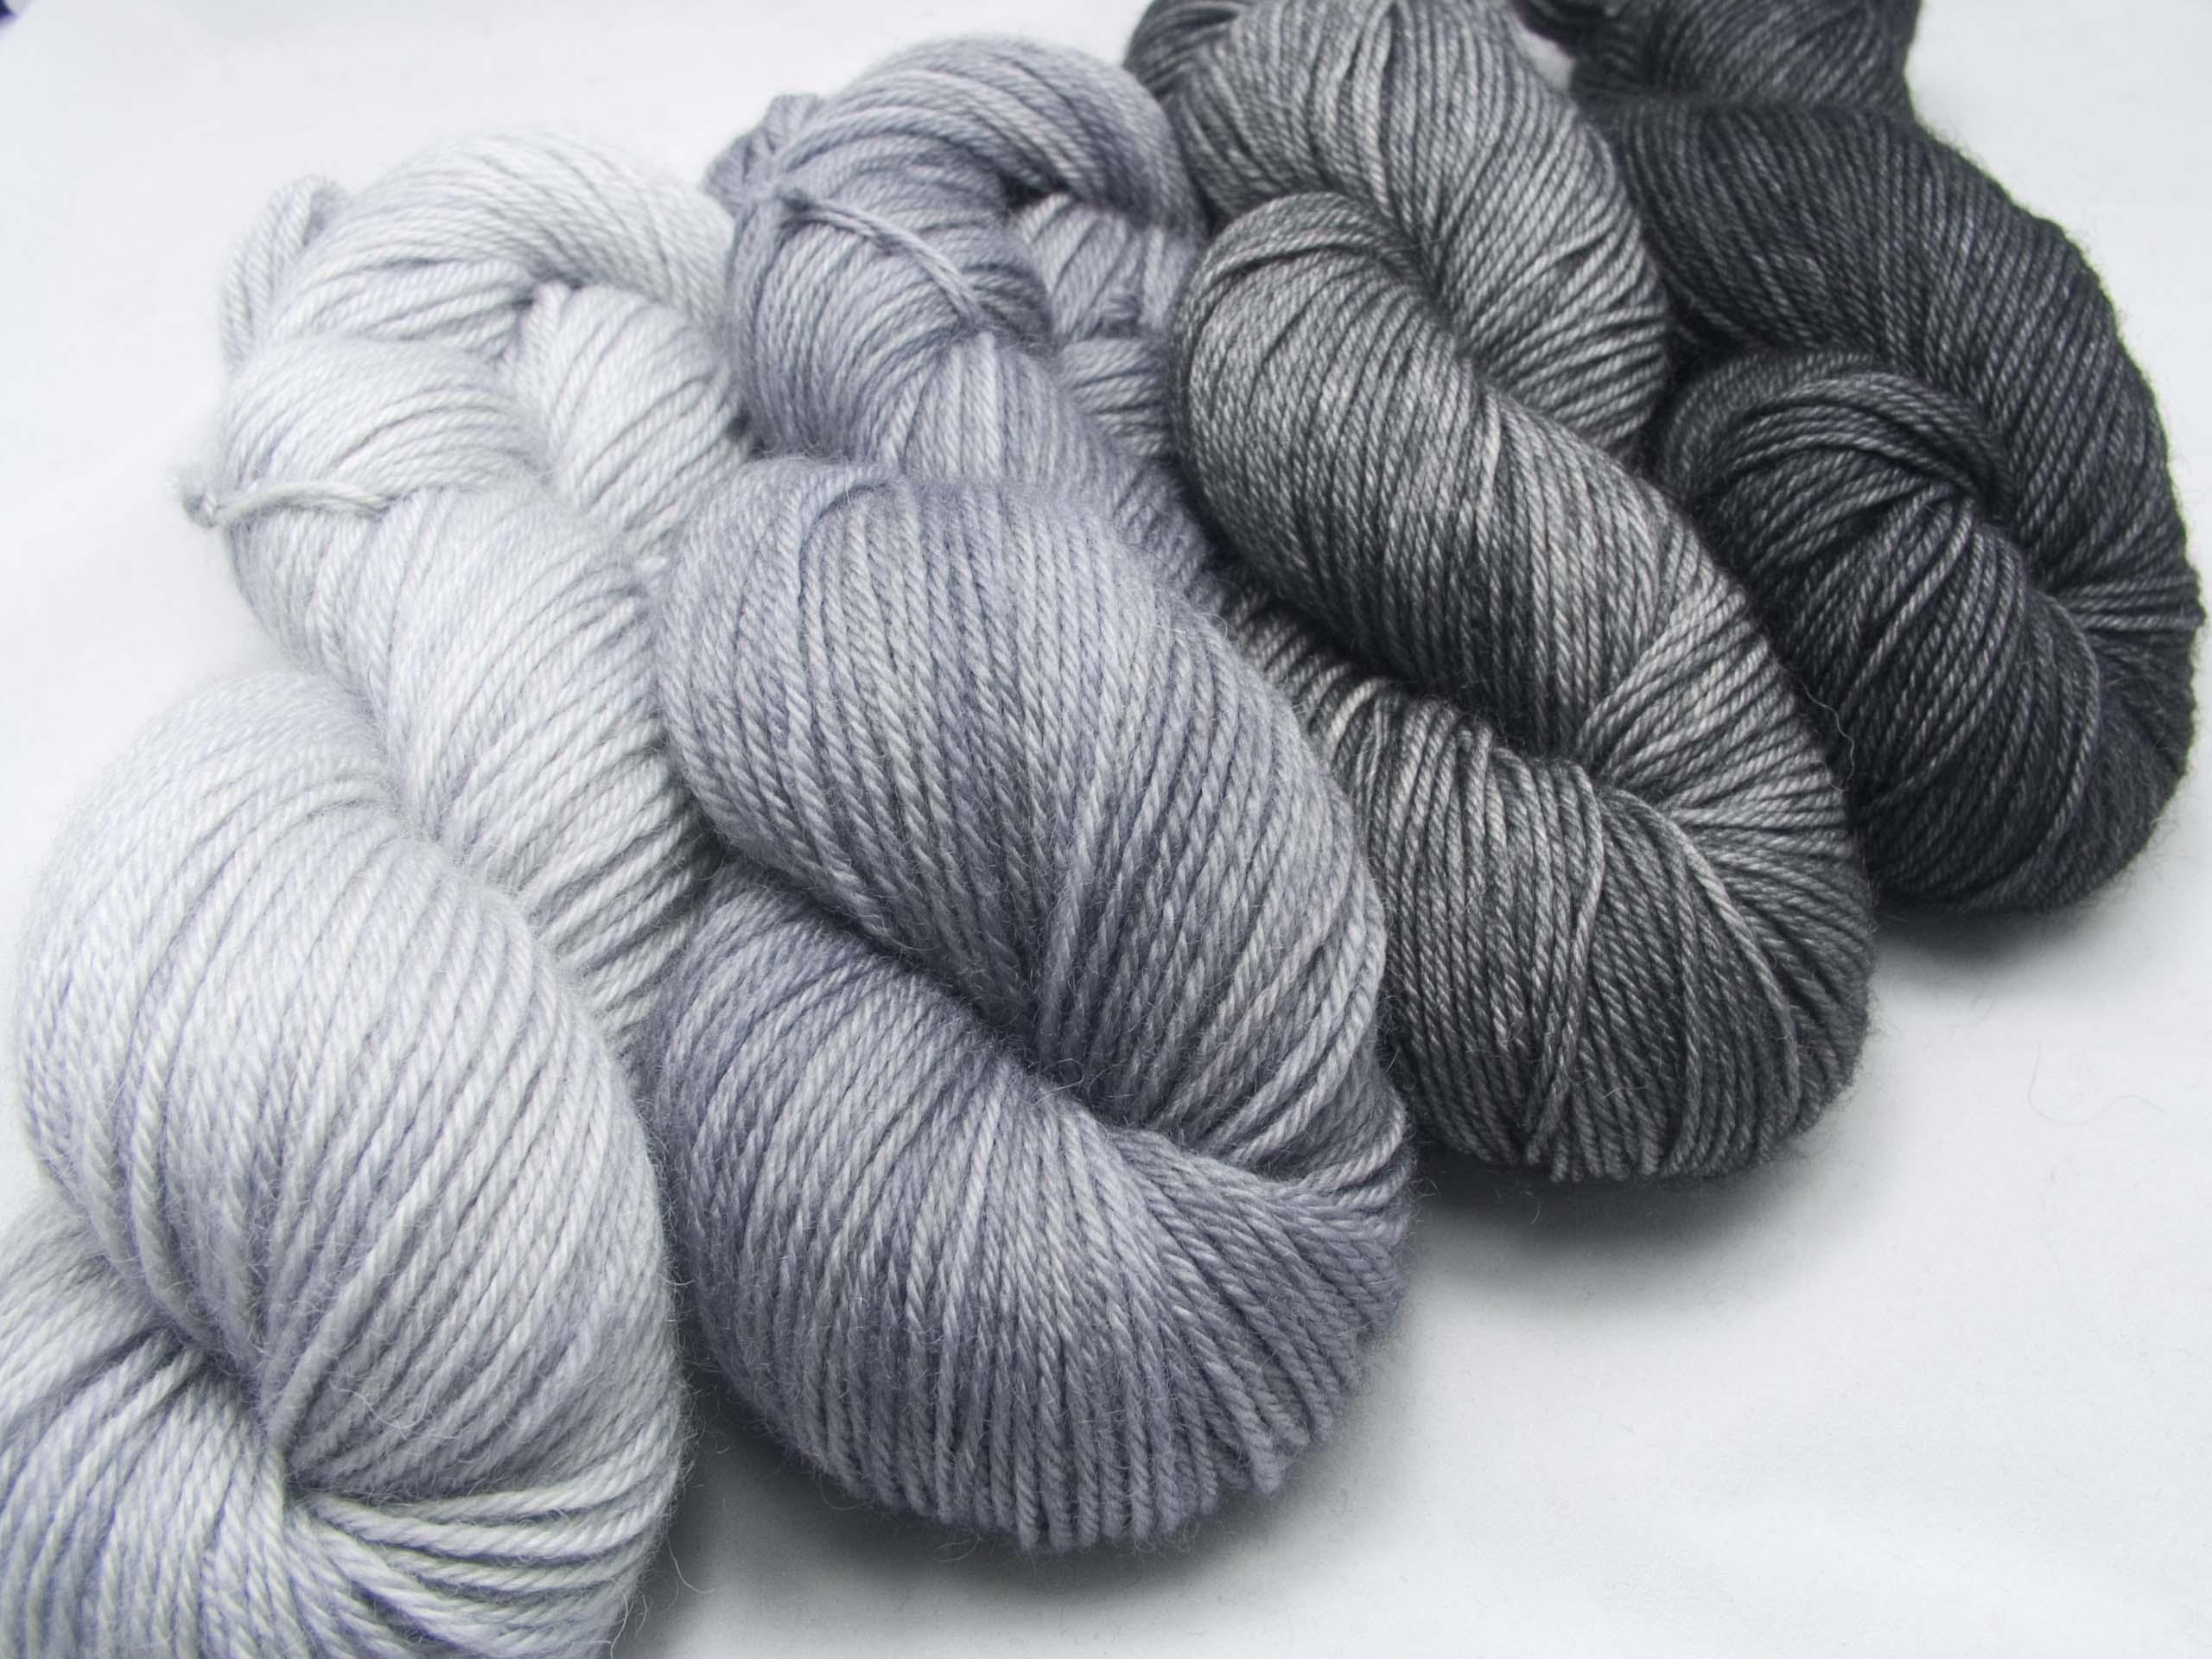 Taliesin DK Greys